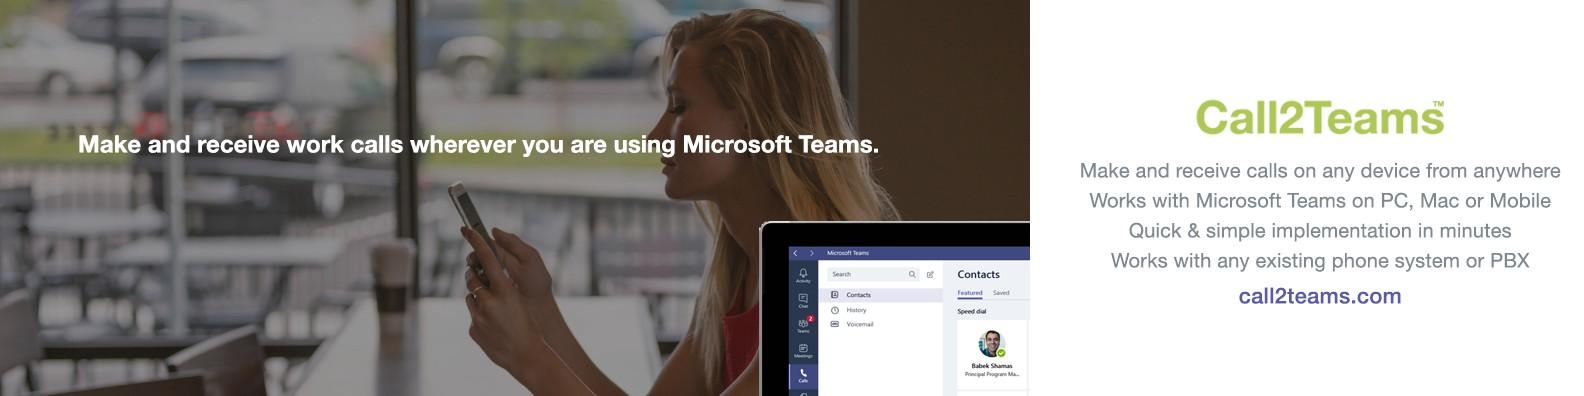 Call2Teams | LinkedIn